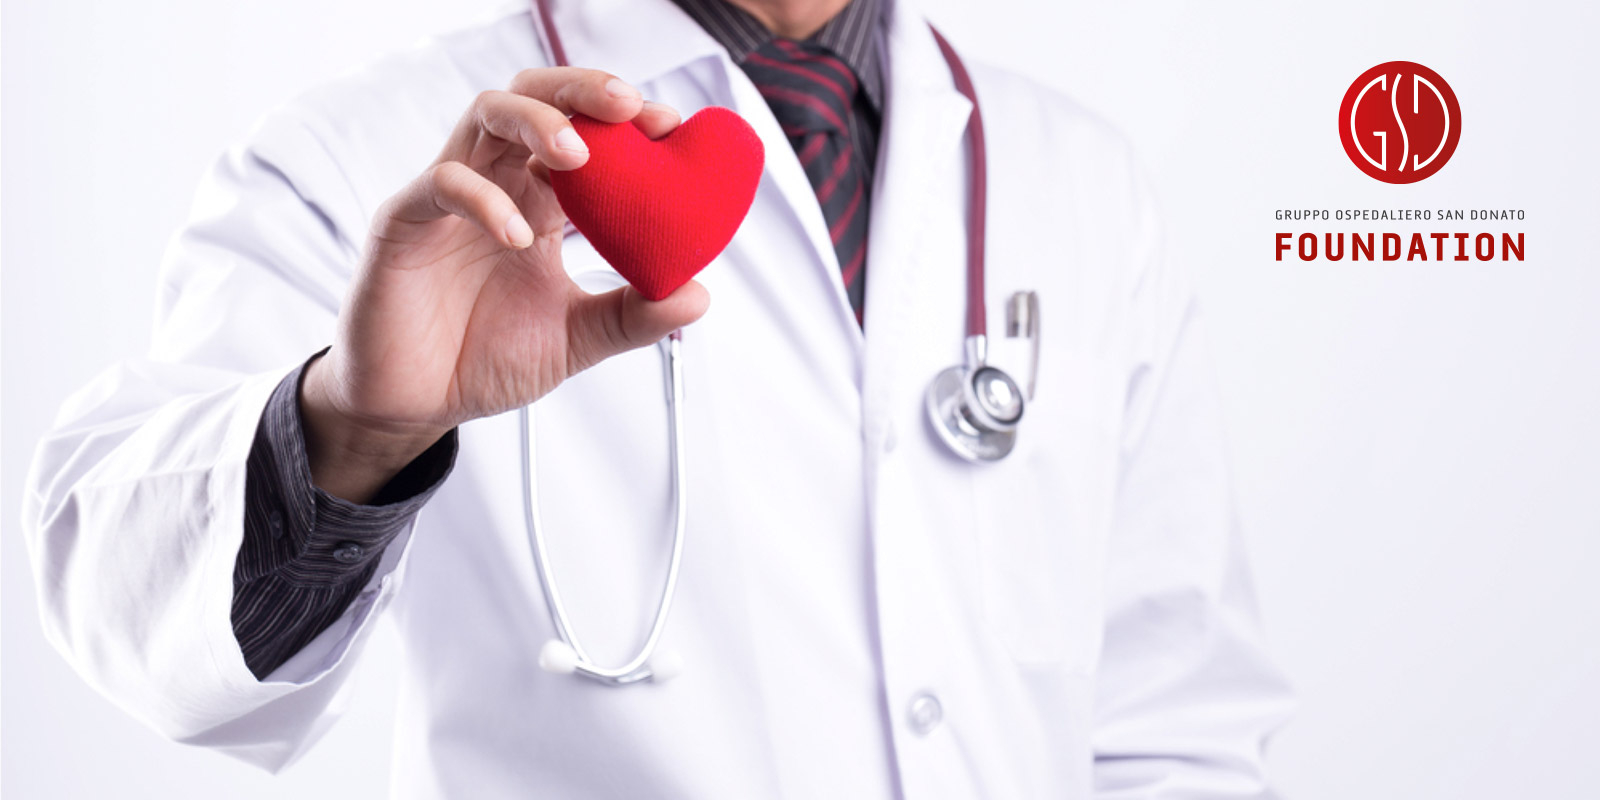 cover gruppo ospedaliero san donato